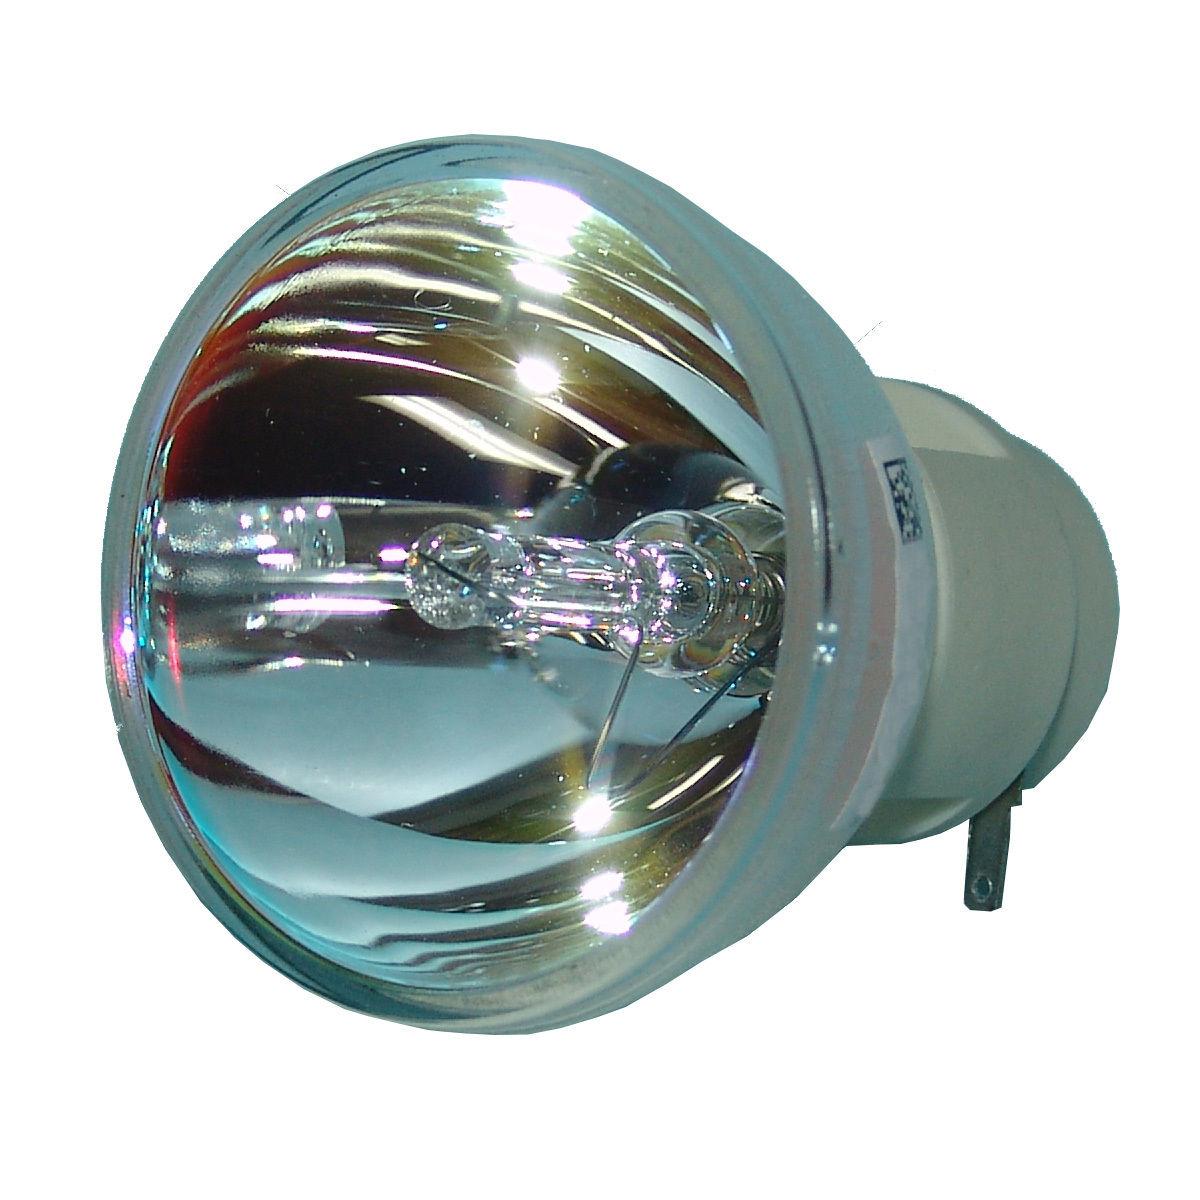 Compatible Bare Bulb VLT-XD560LP for MITSUBISHI GH-670/GW-360ST/GW-365ST/GW-370ST/GW-385ST/GW-665 Projector lamp without housing 100% brand new compatible projector bare lamp with housing vlt xd560lp for mitsubishi gw 370st gx 660 gx 665 gx 680 wd380u est